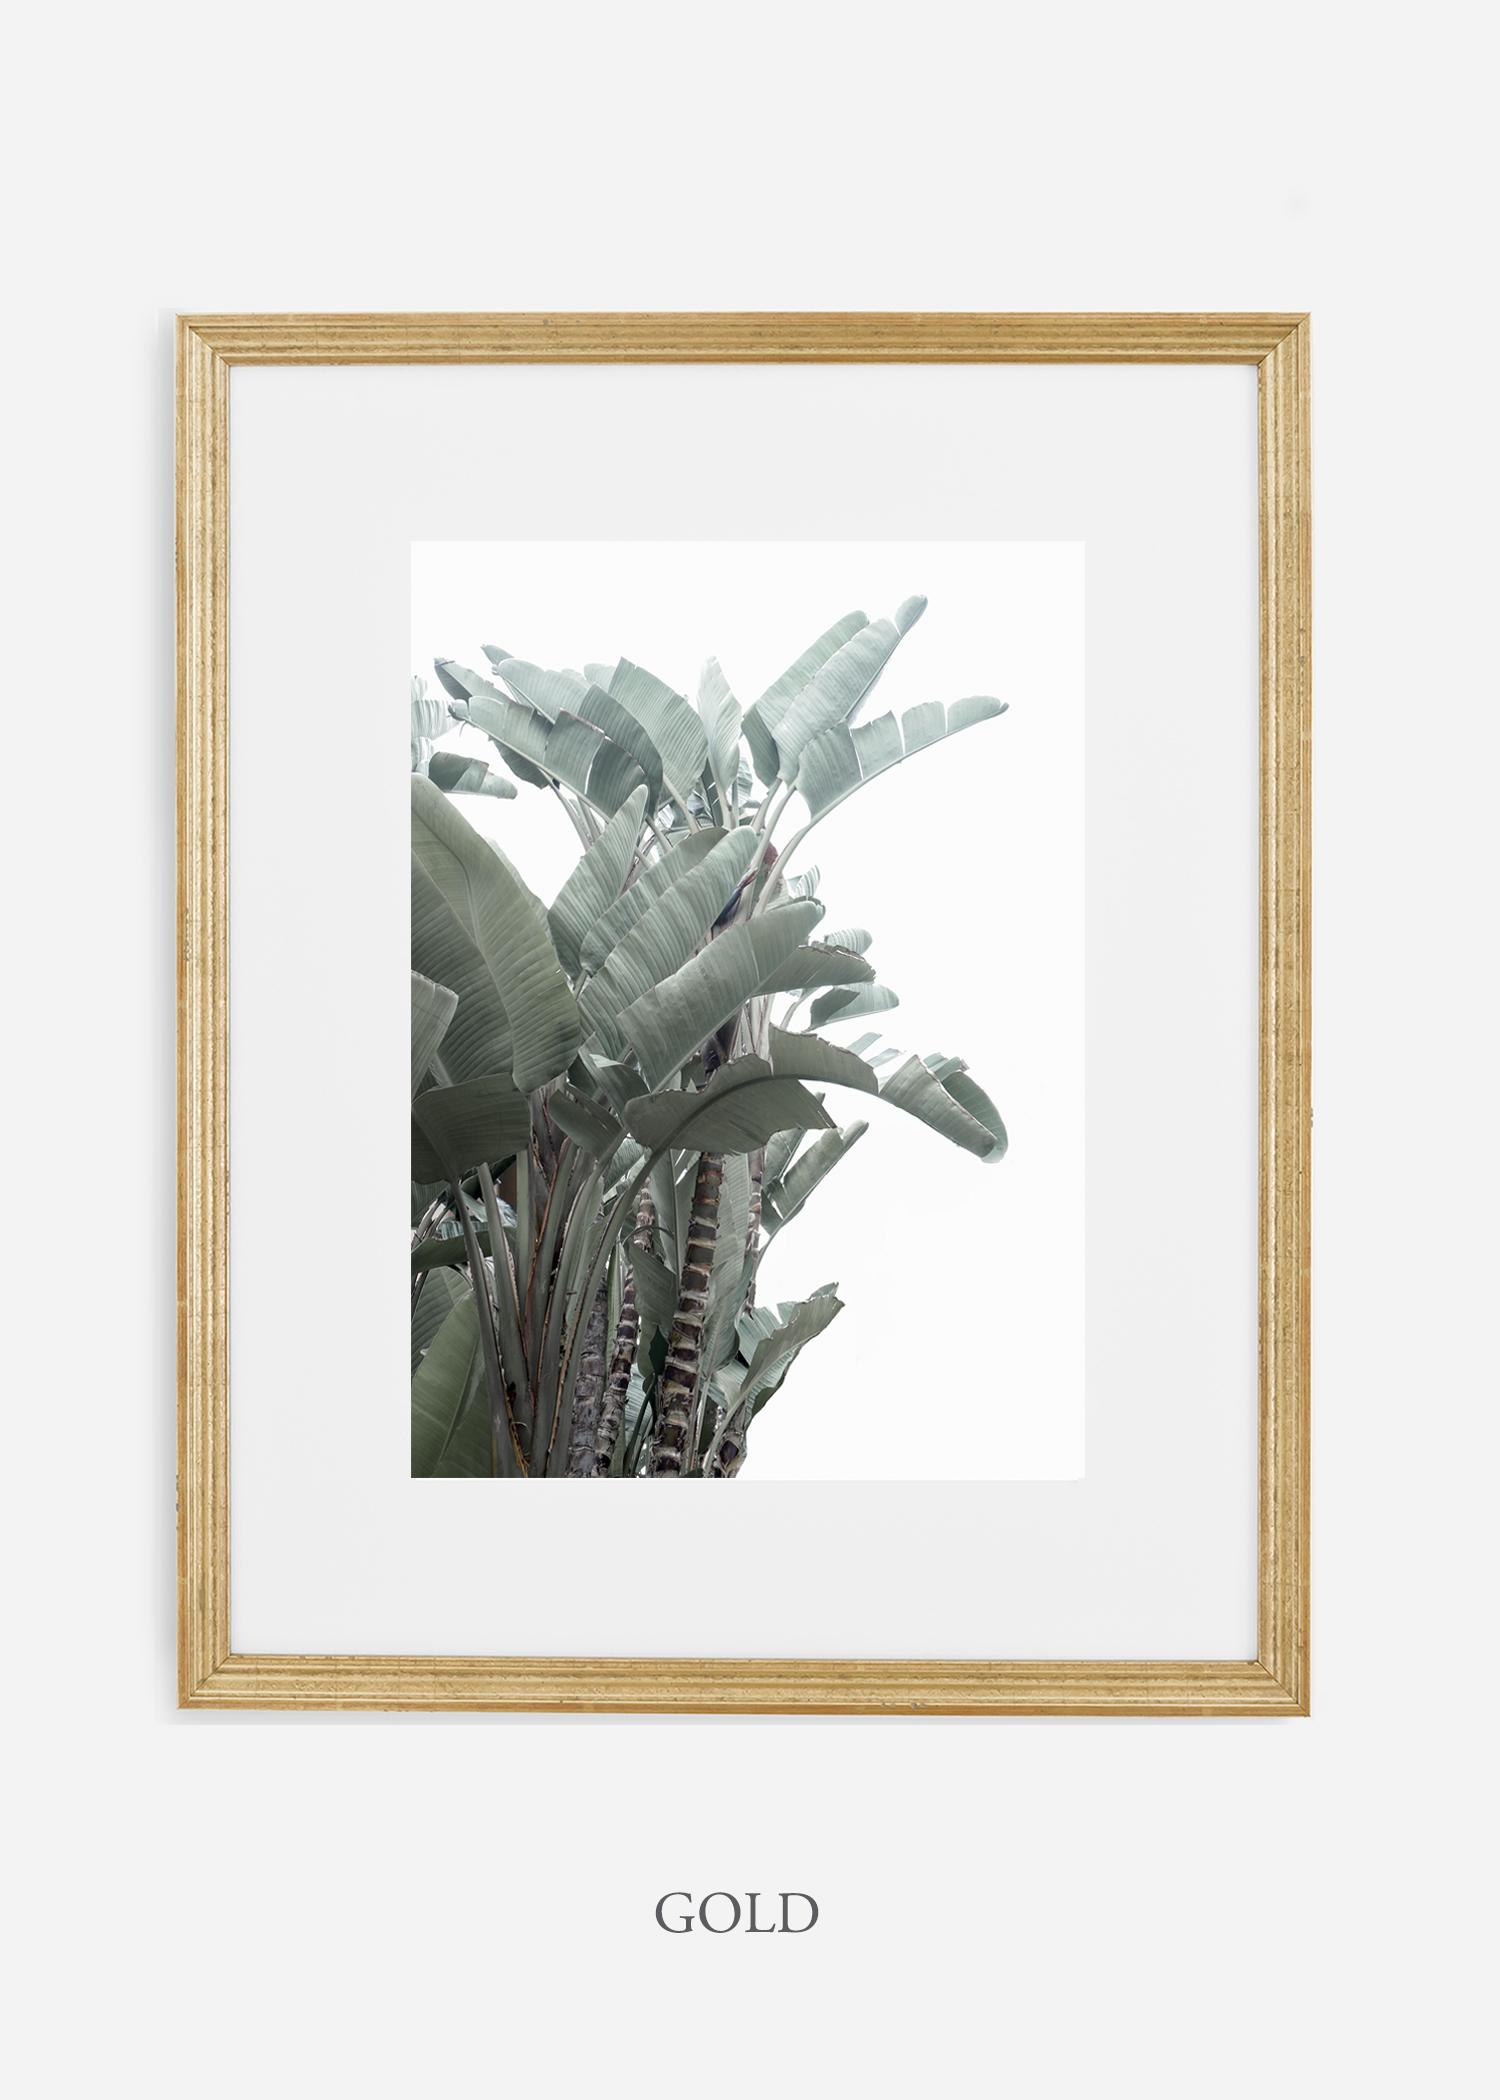 wildercalifornia_goldframe_WinterWhite_BananaLeafNo.1_Tropical_LosAngeles_Art_HomeDecor_interiordesign_design.jpg